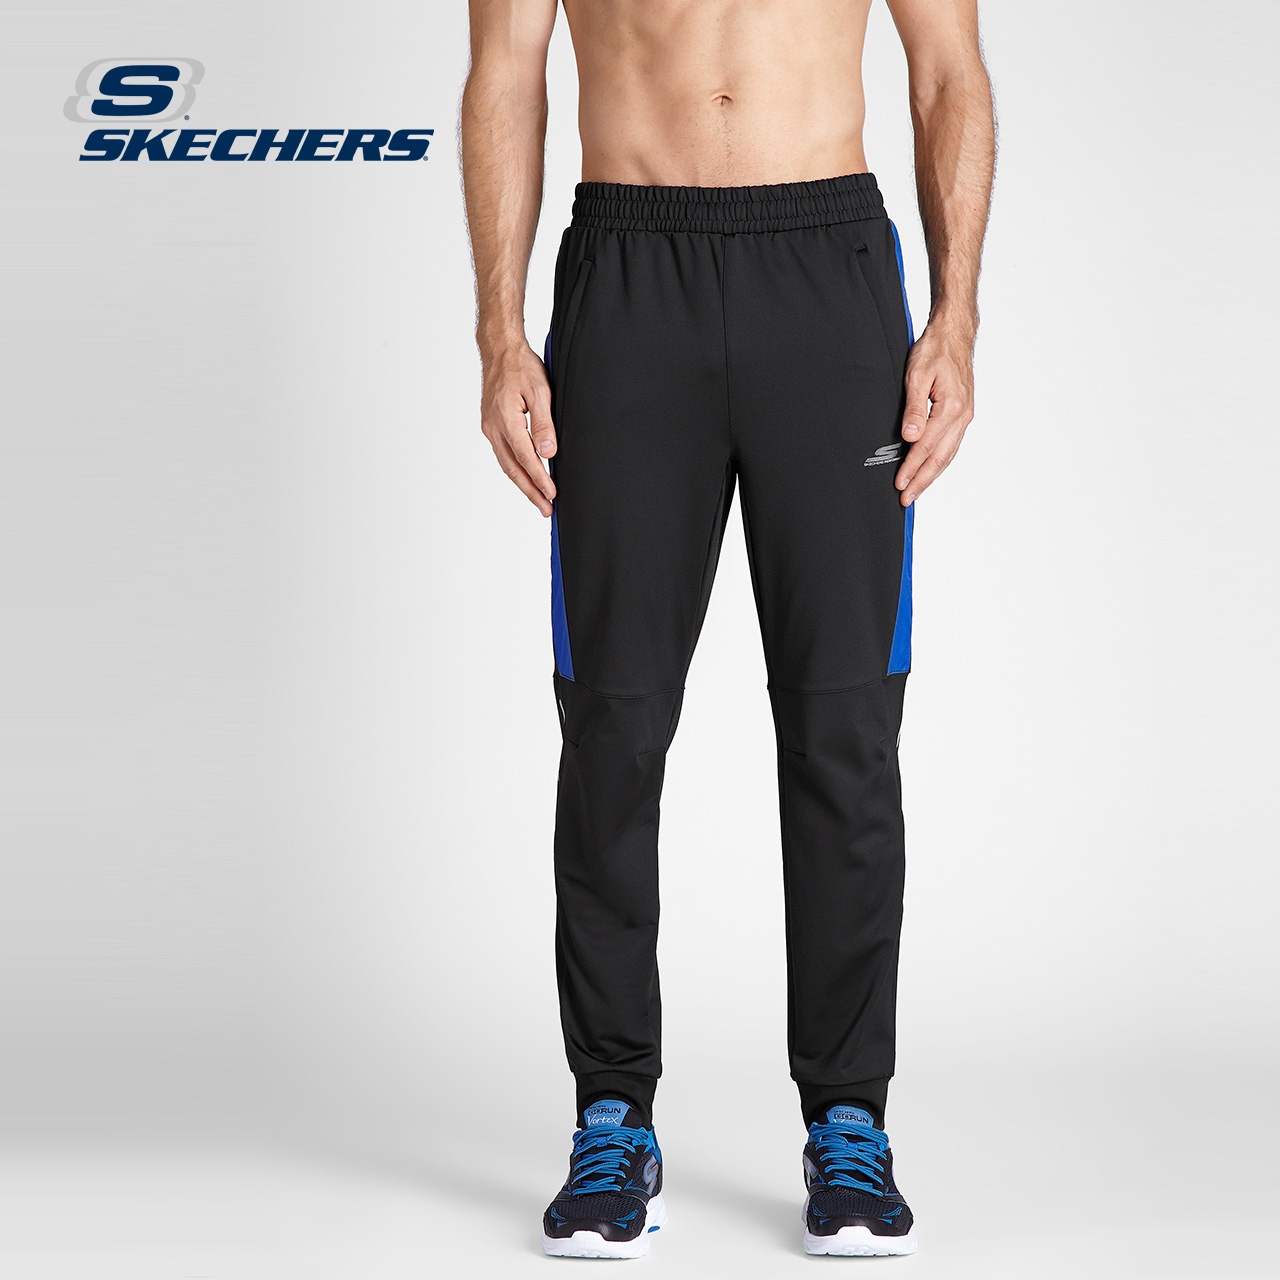 SKECHERS training pants